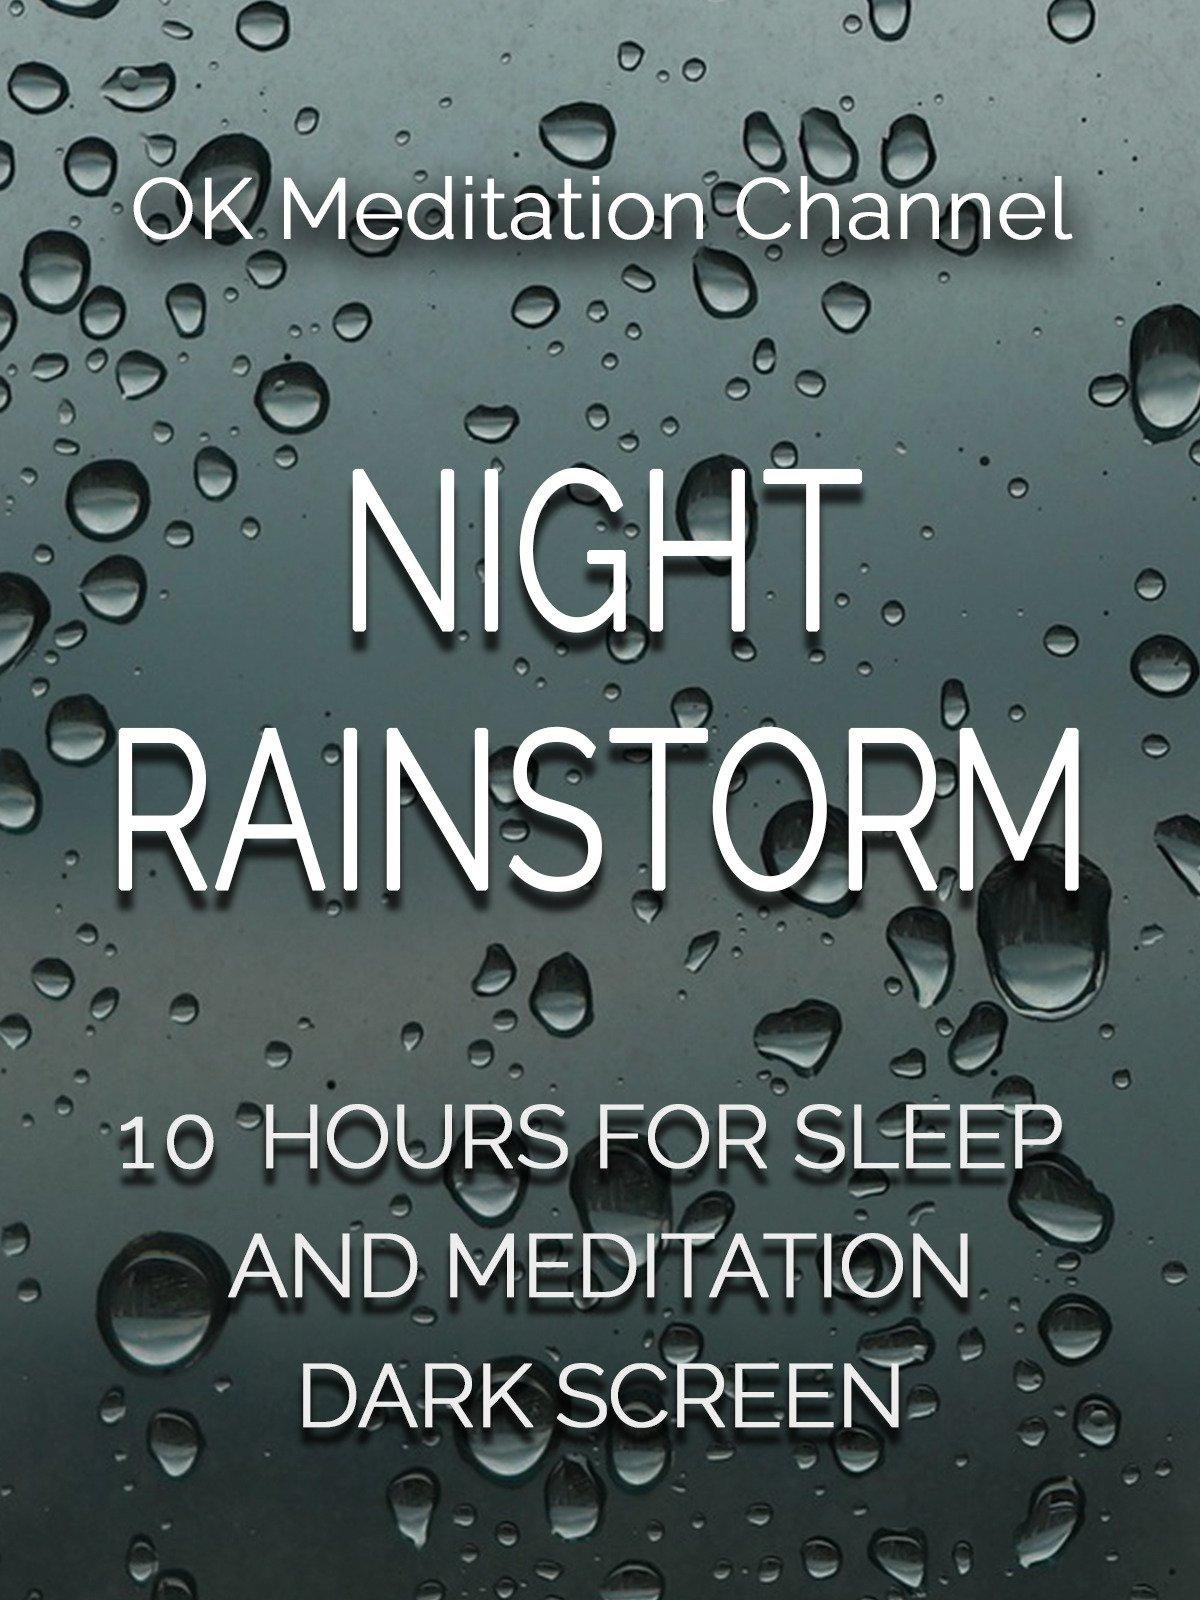 Night rainstorm, 10 hours for sleep and meditation, dark screen